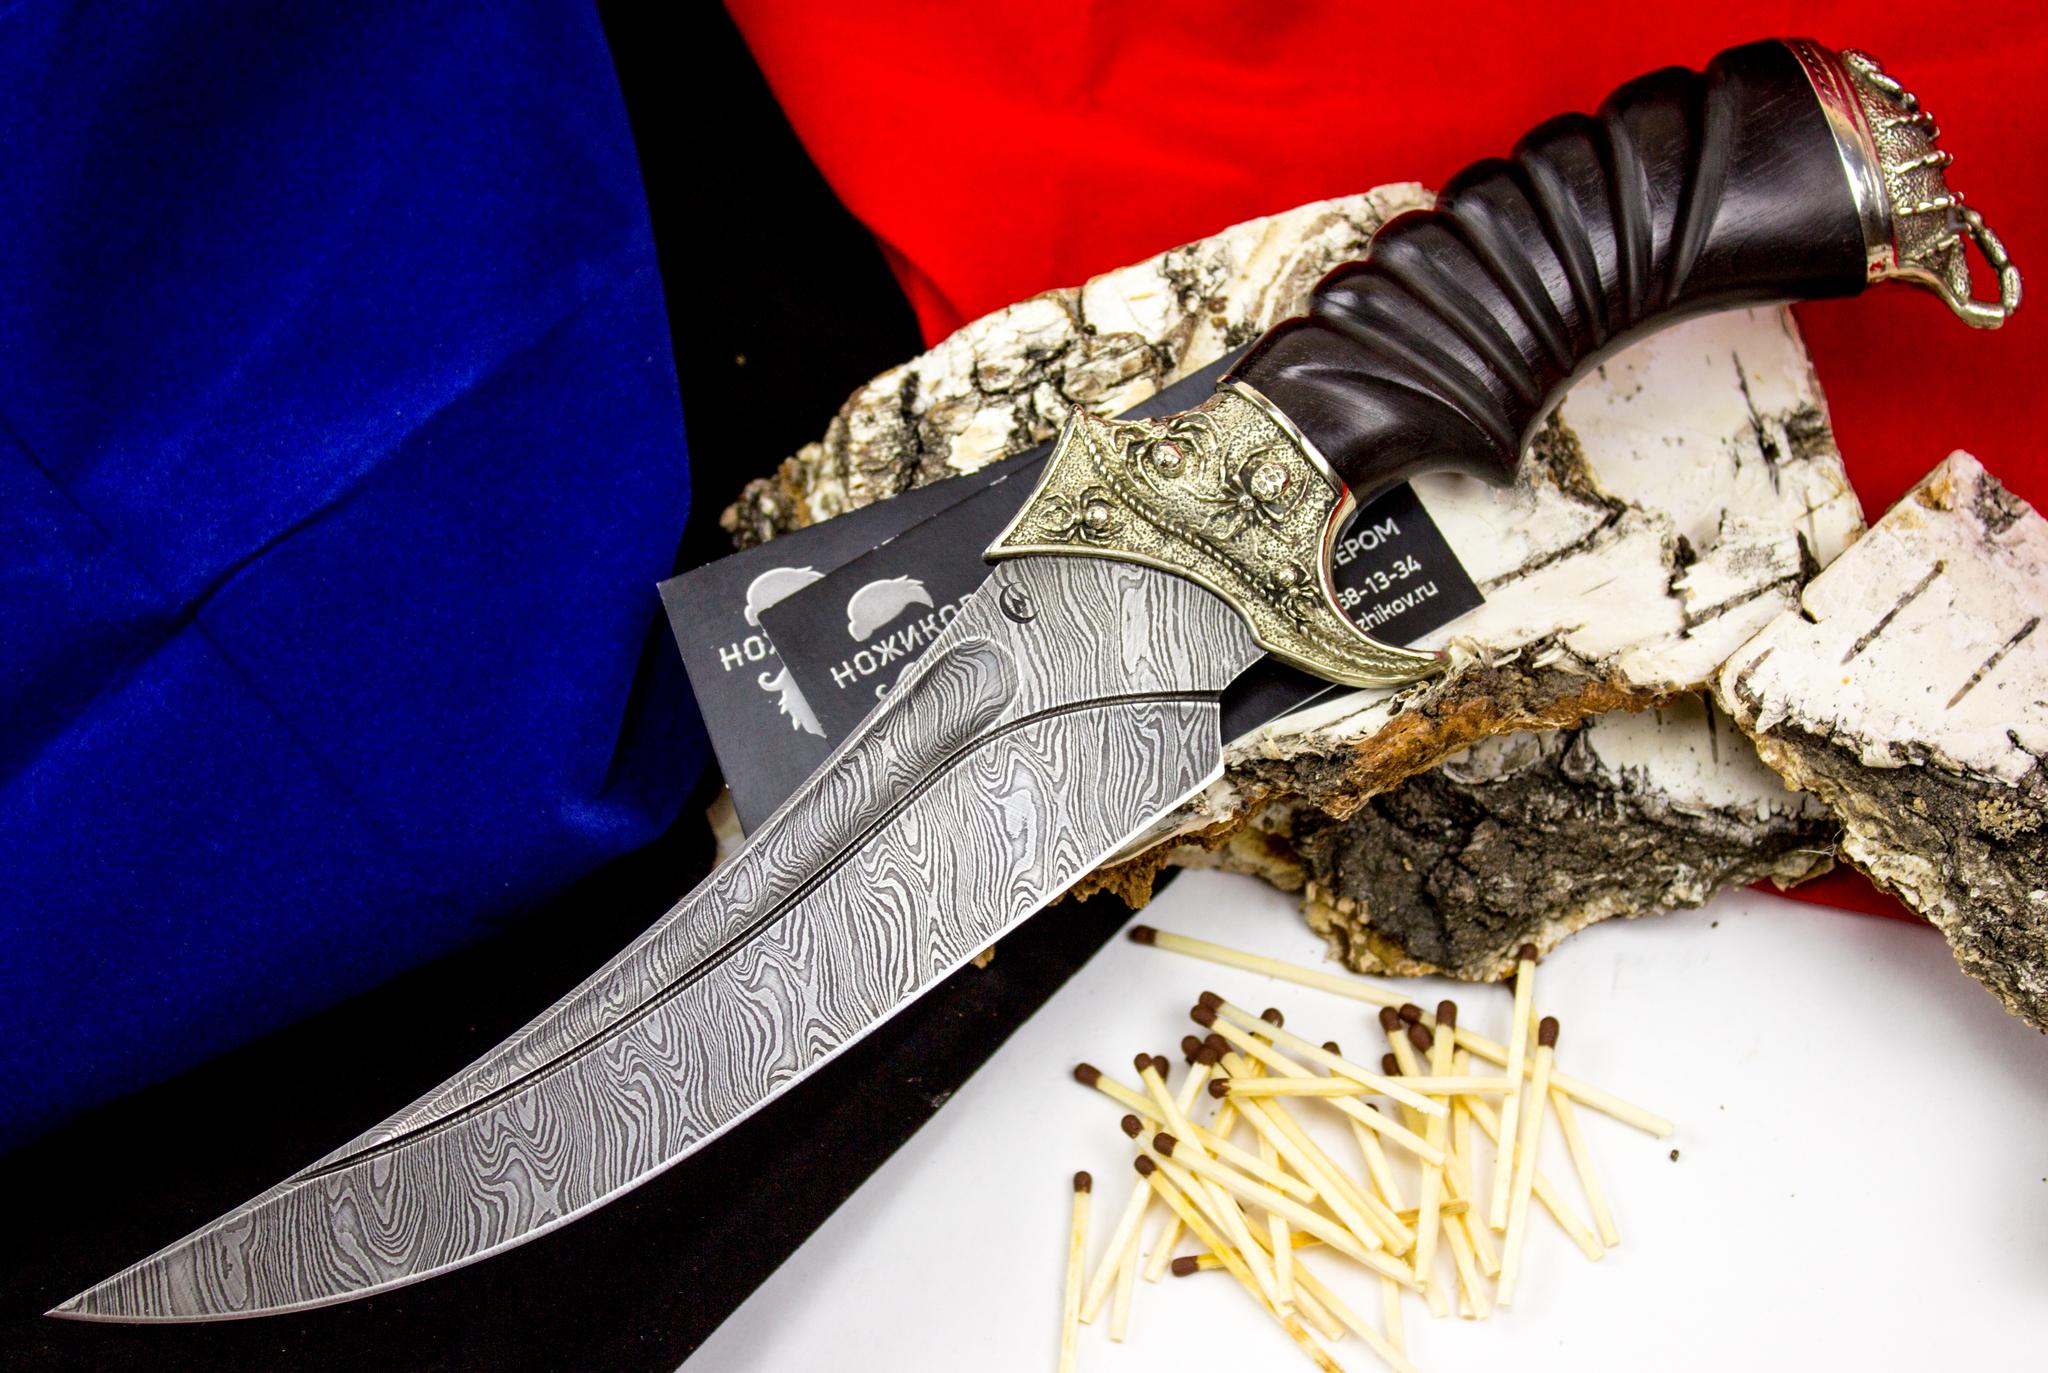 Фото 5 - Нож Корсар с резной рукоятью , дамасская сталь от Кузница Семина